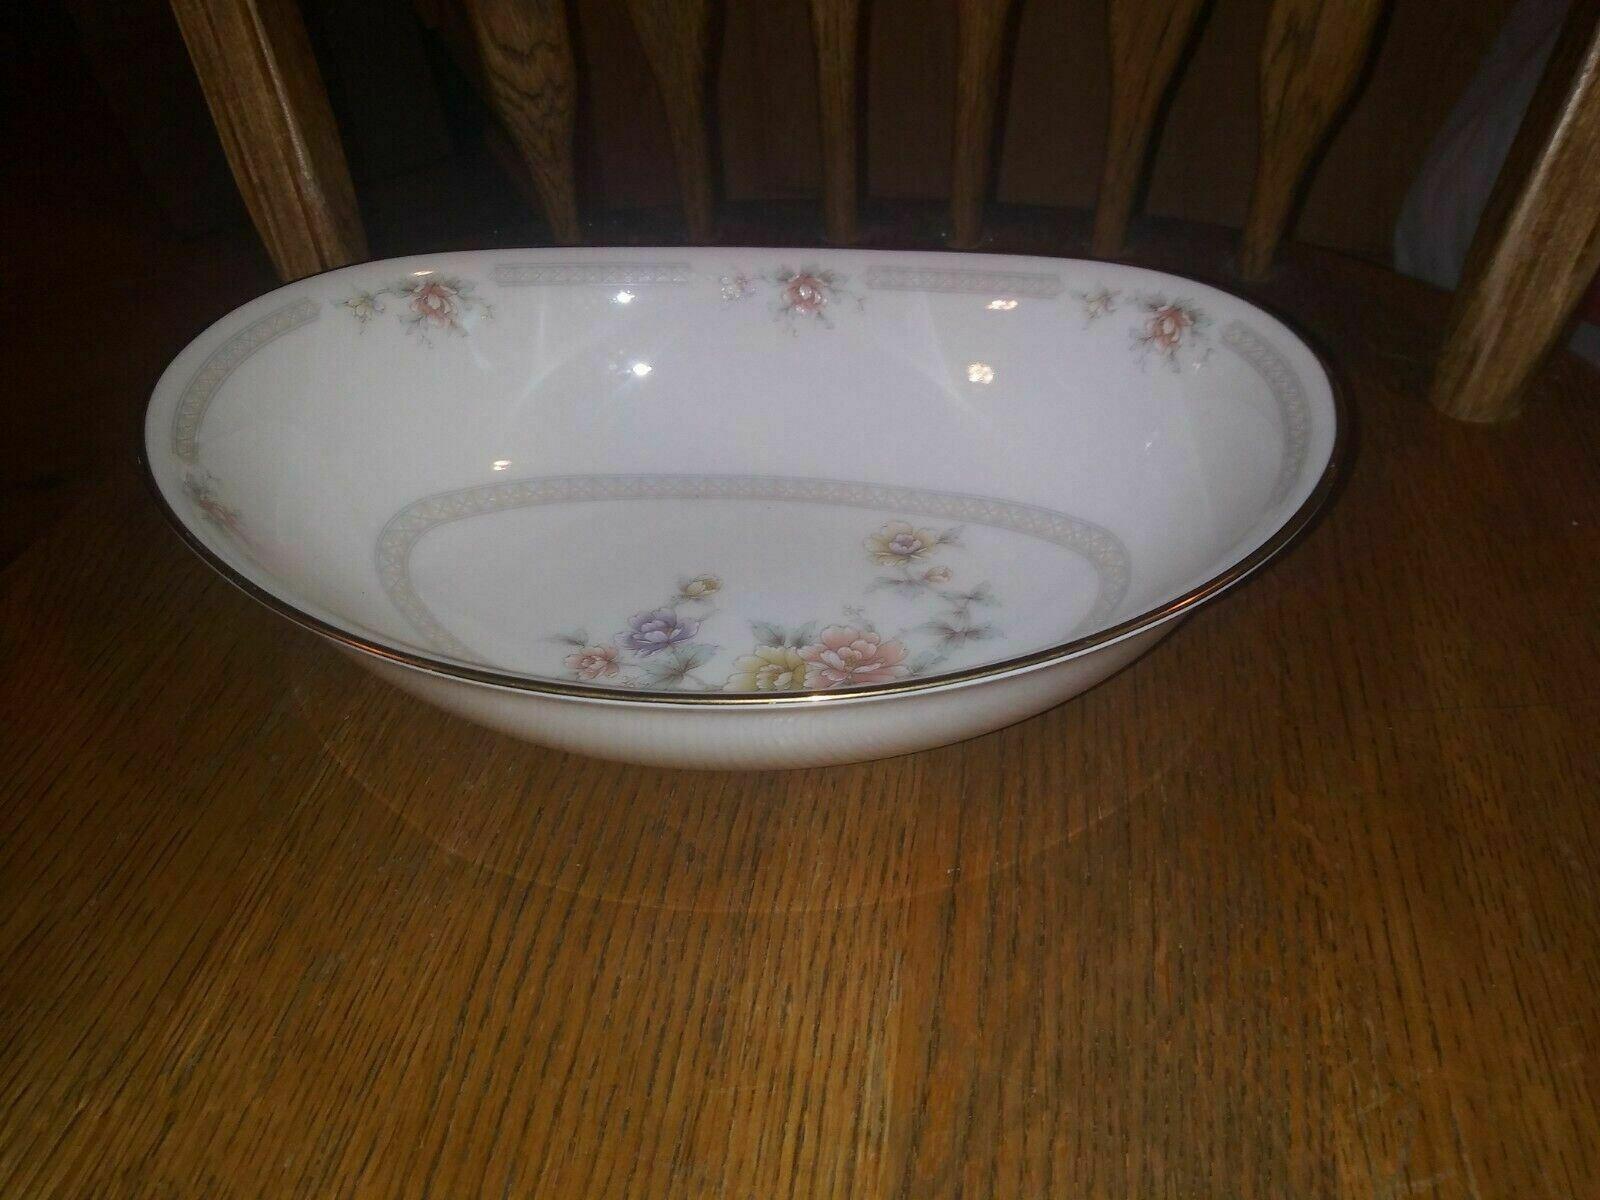 "9"" Oval Vegetable Bowl Cervantes 7261 byNORITAKE - $37.99"